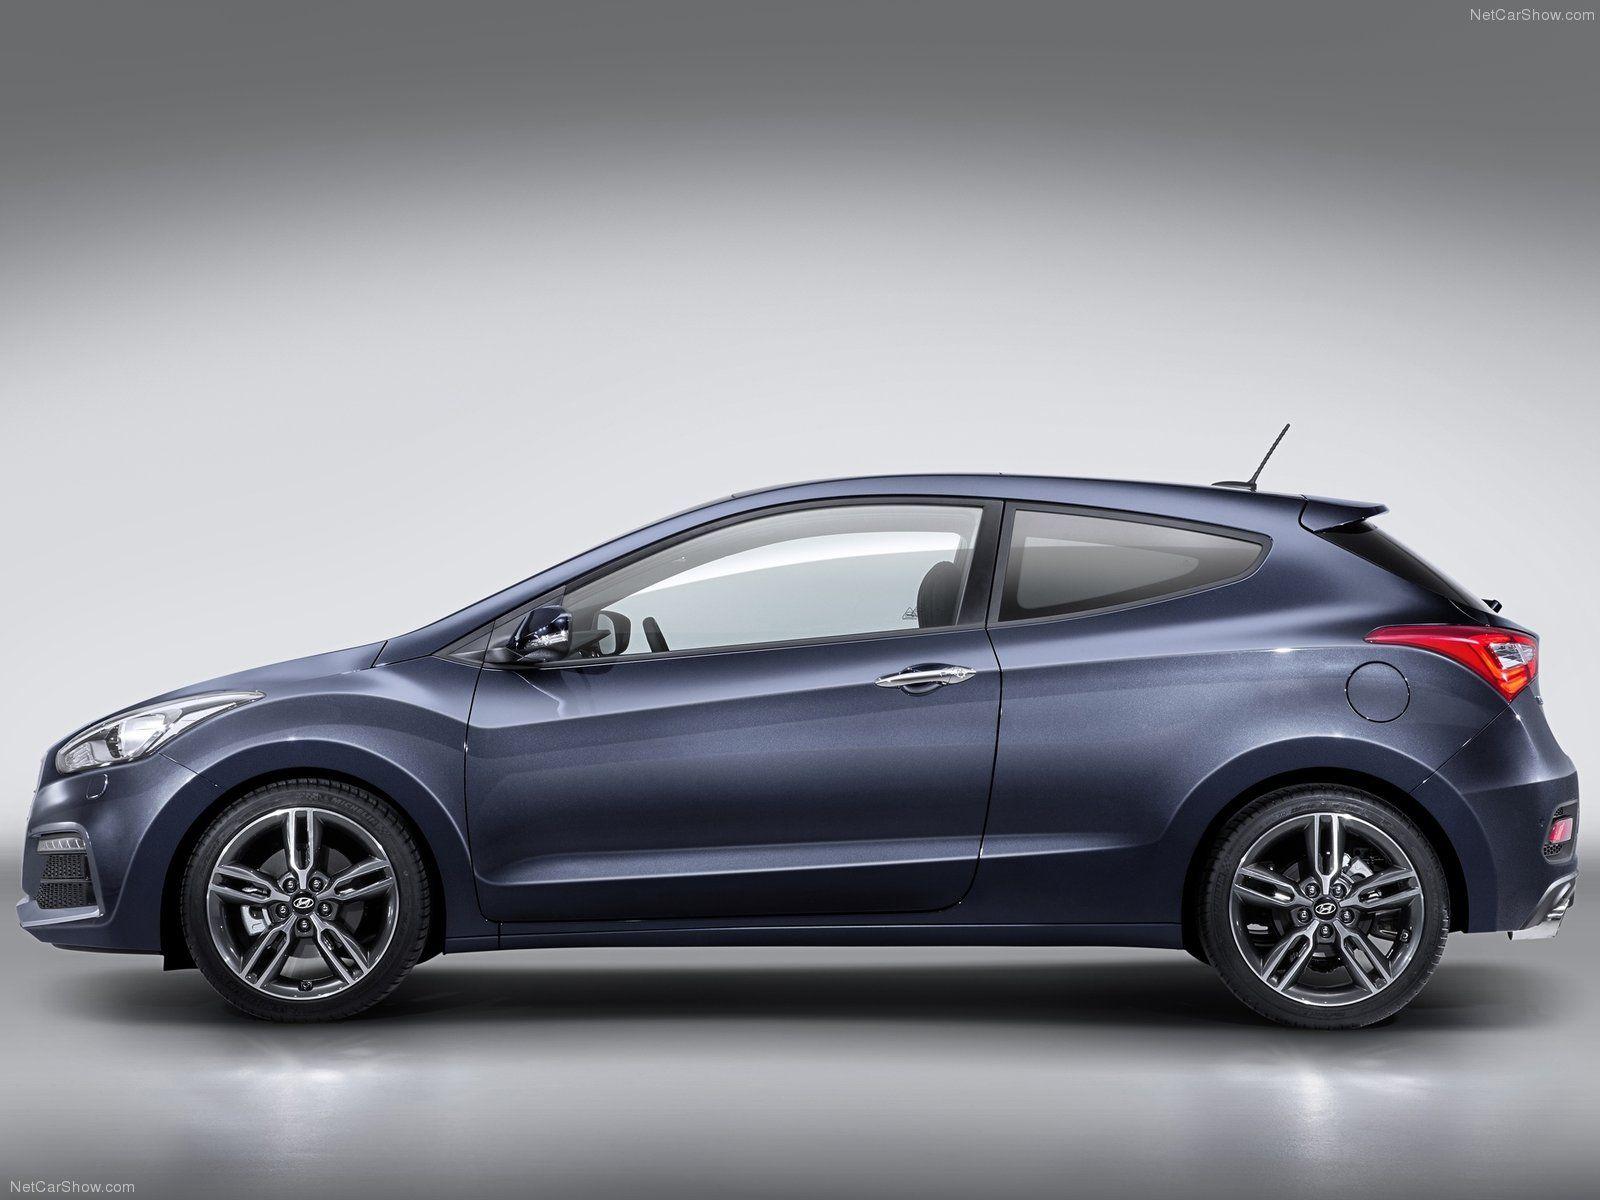 2015 Hyundai i30 Turbo Hyundai, New sports cars, Top 10